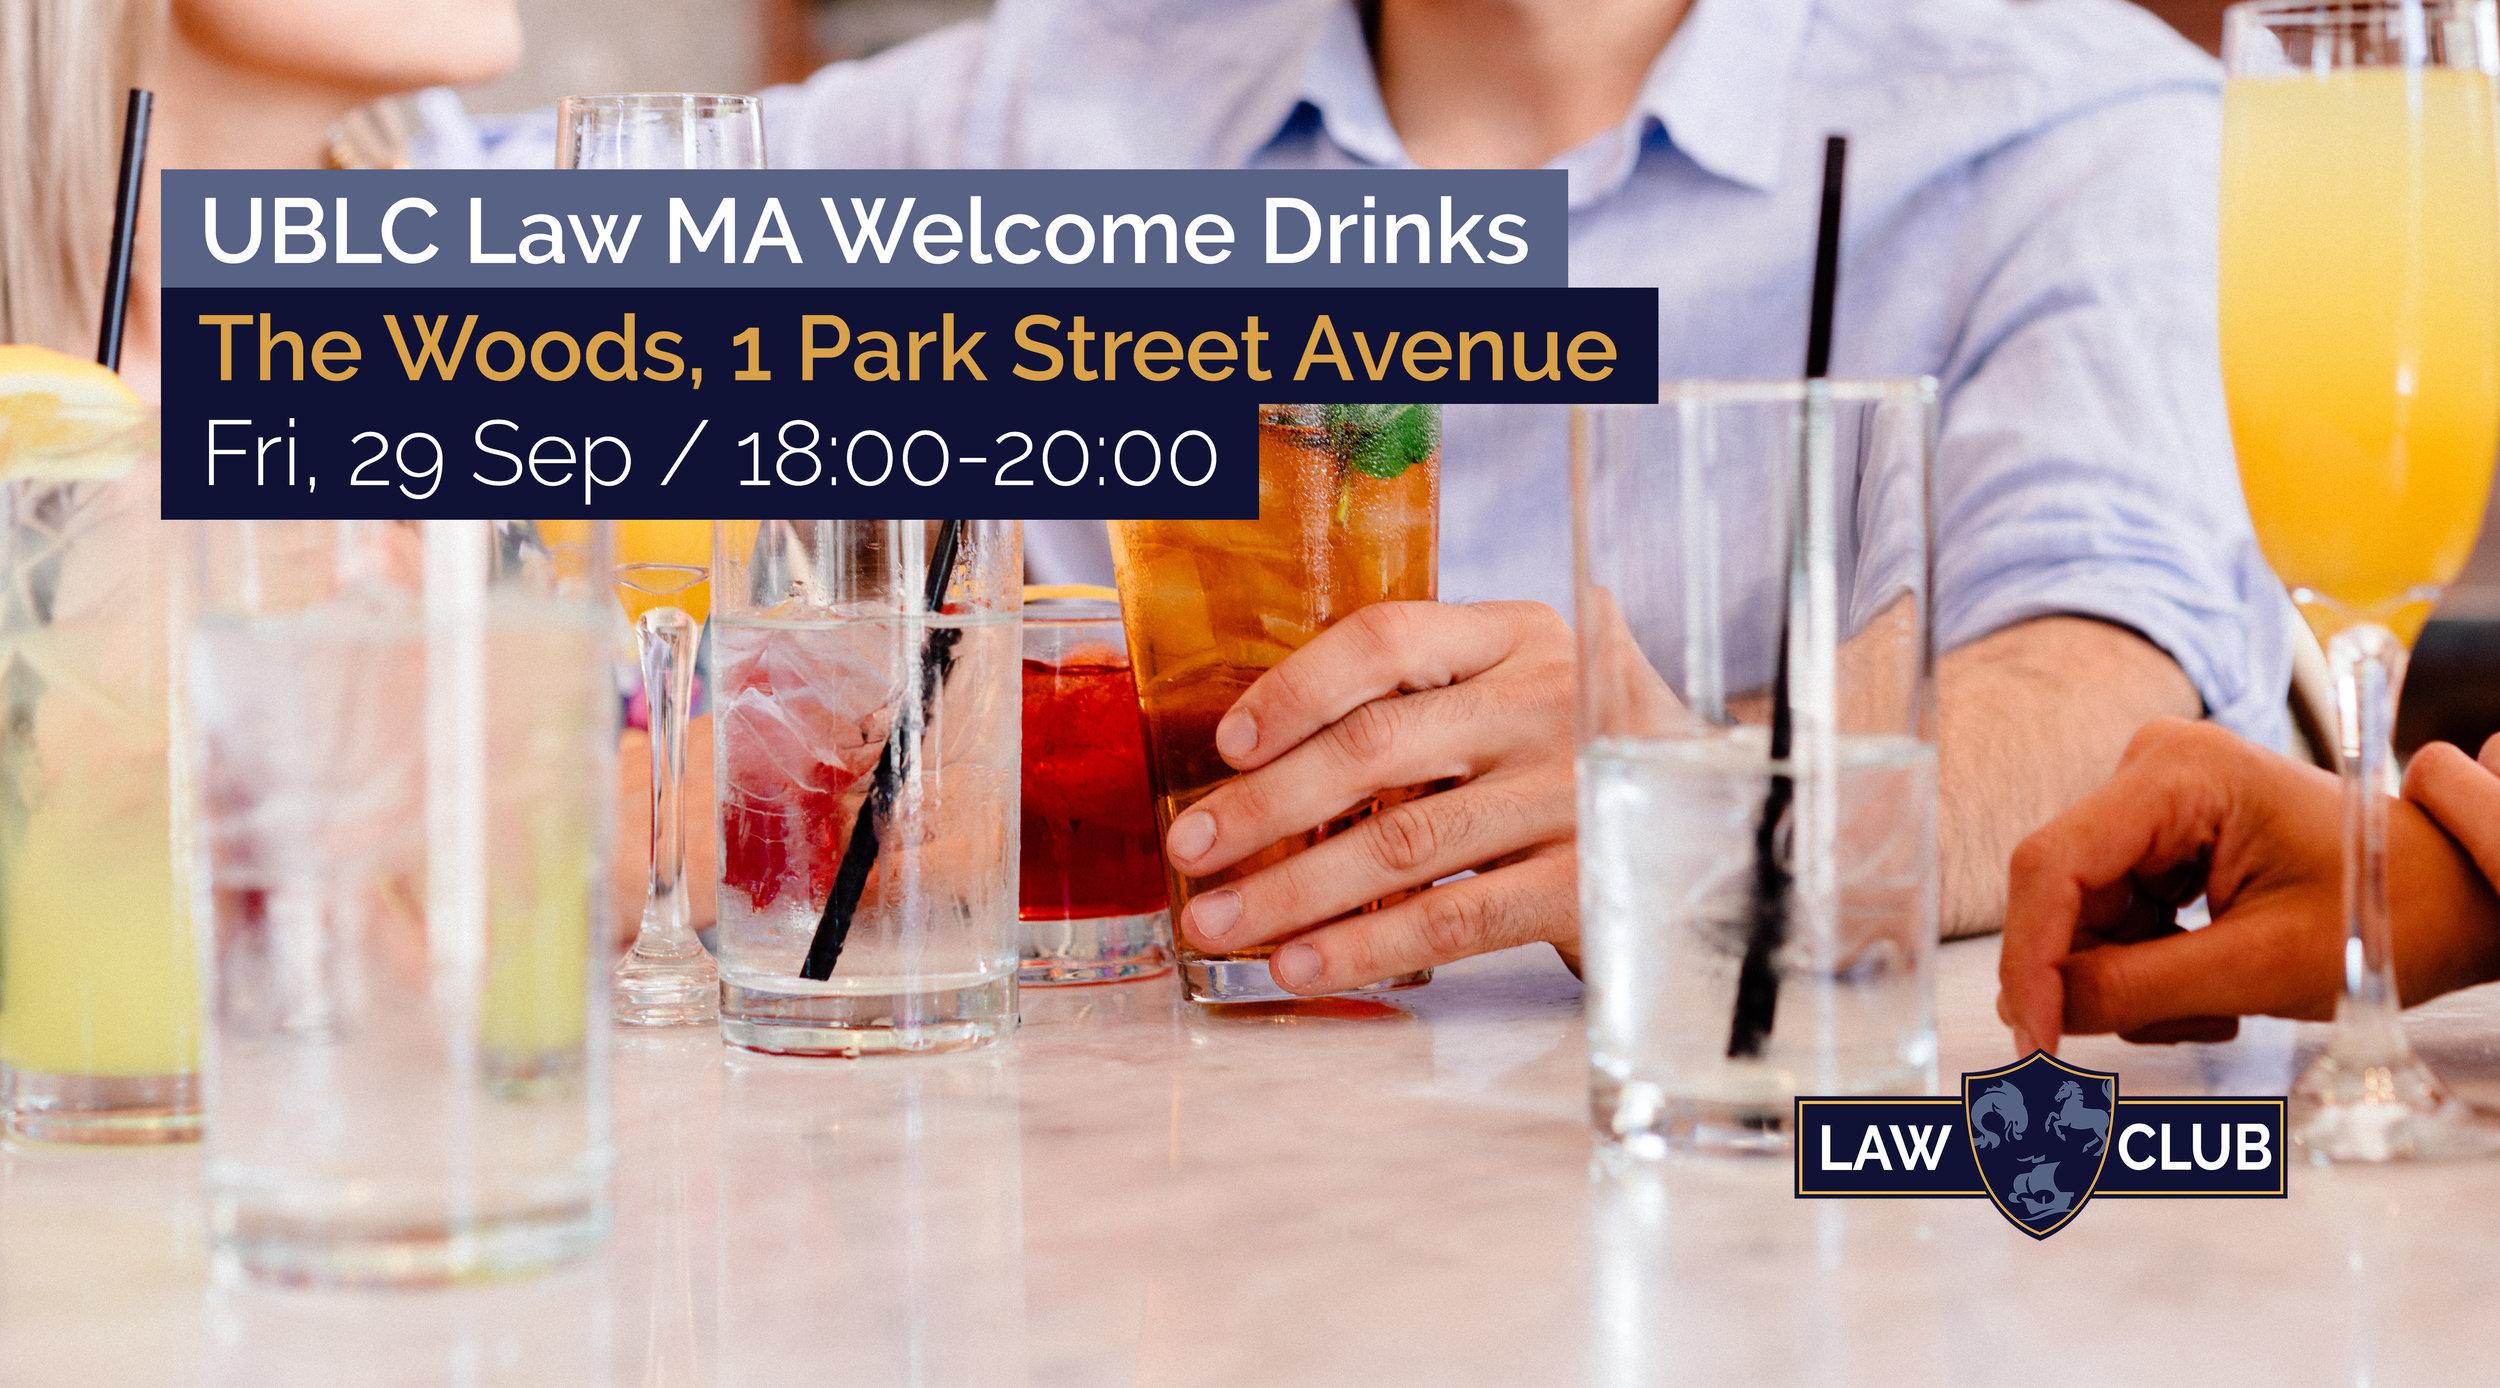 MA welcome drinks.jpg